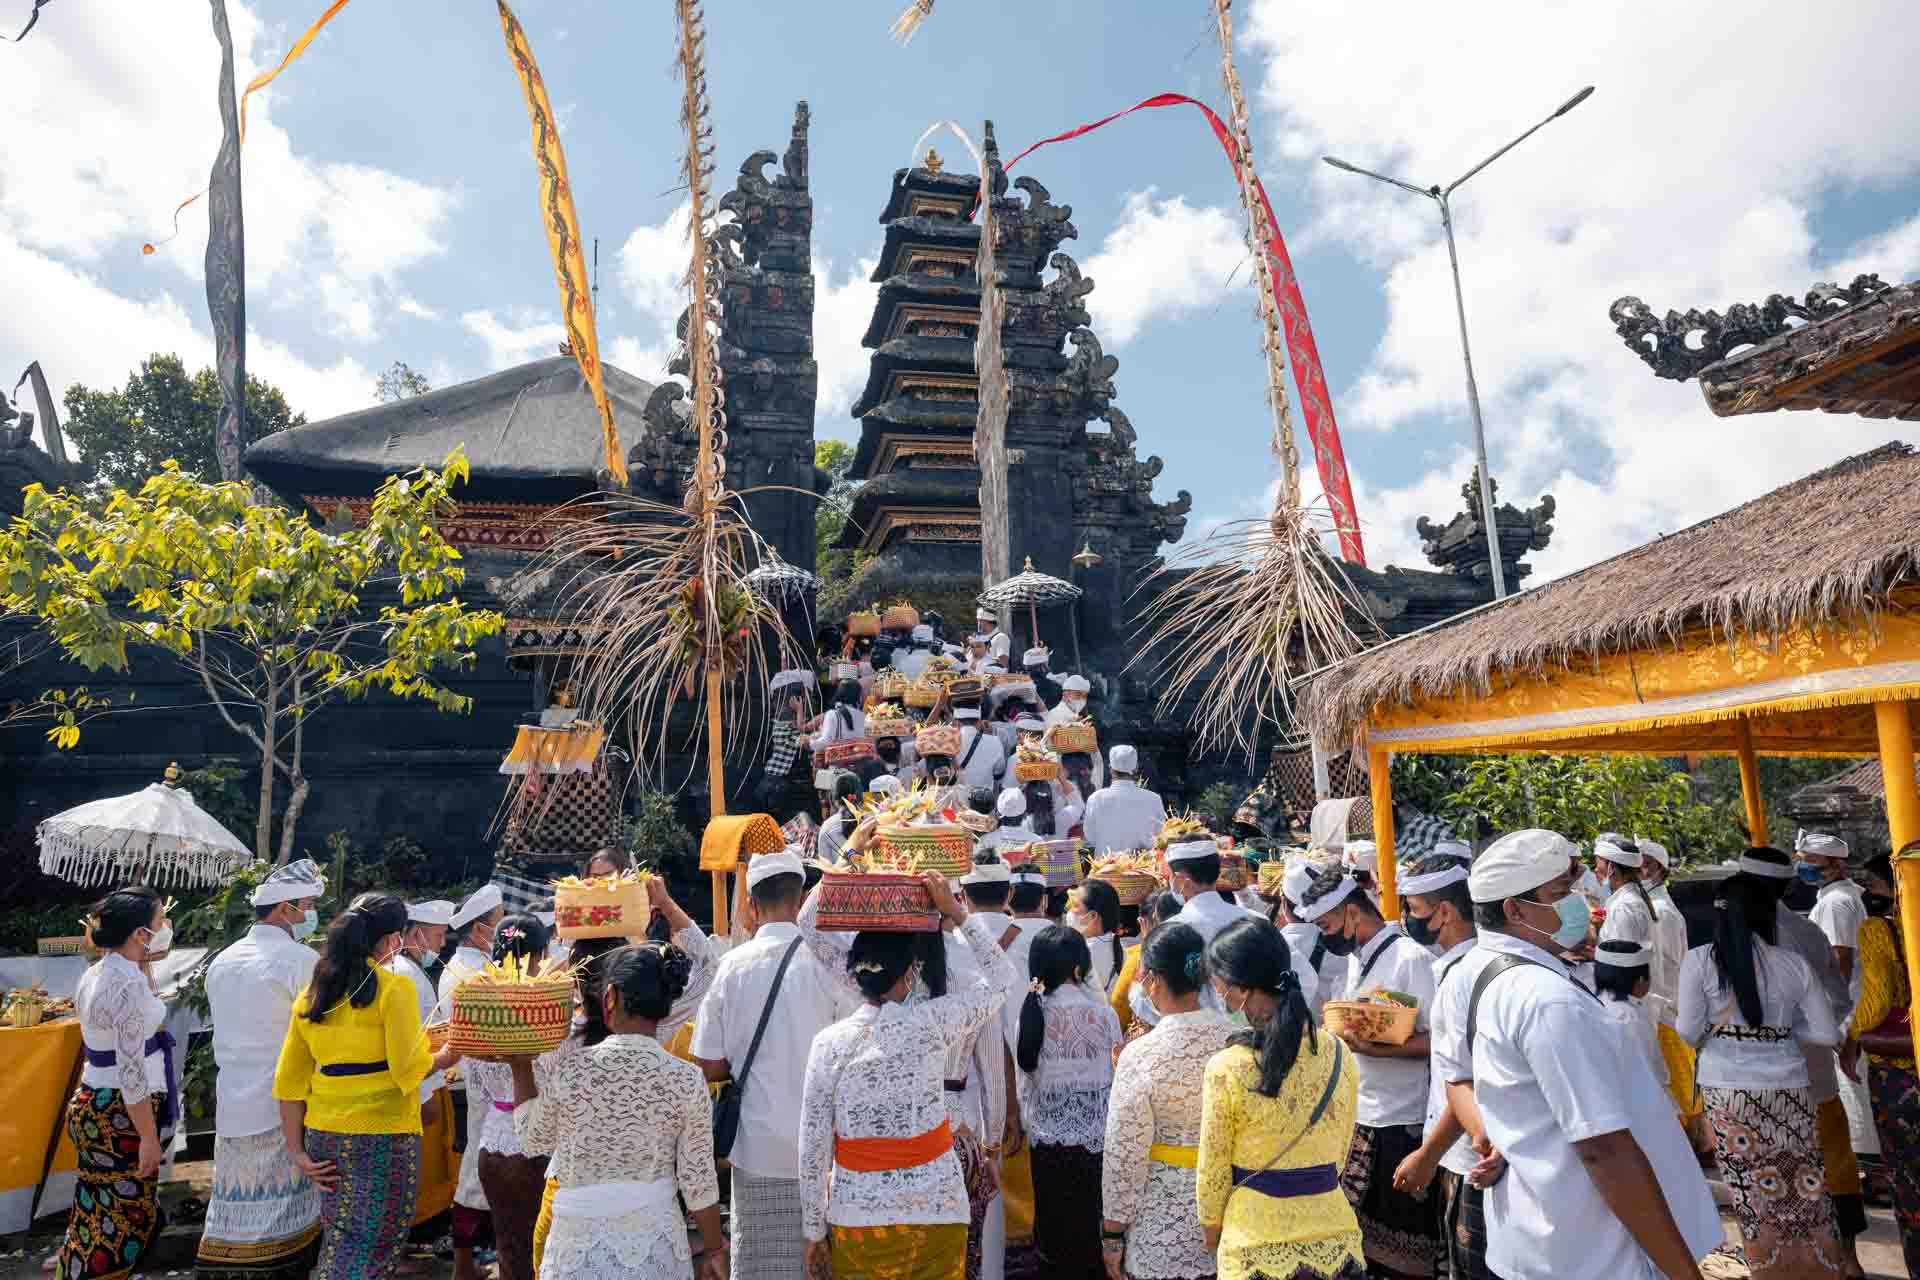 besakih temple, pura besakih, besakih temple bali, pura besakih bali, besakih mother temple